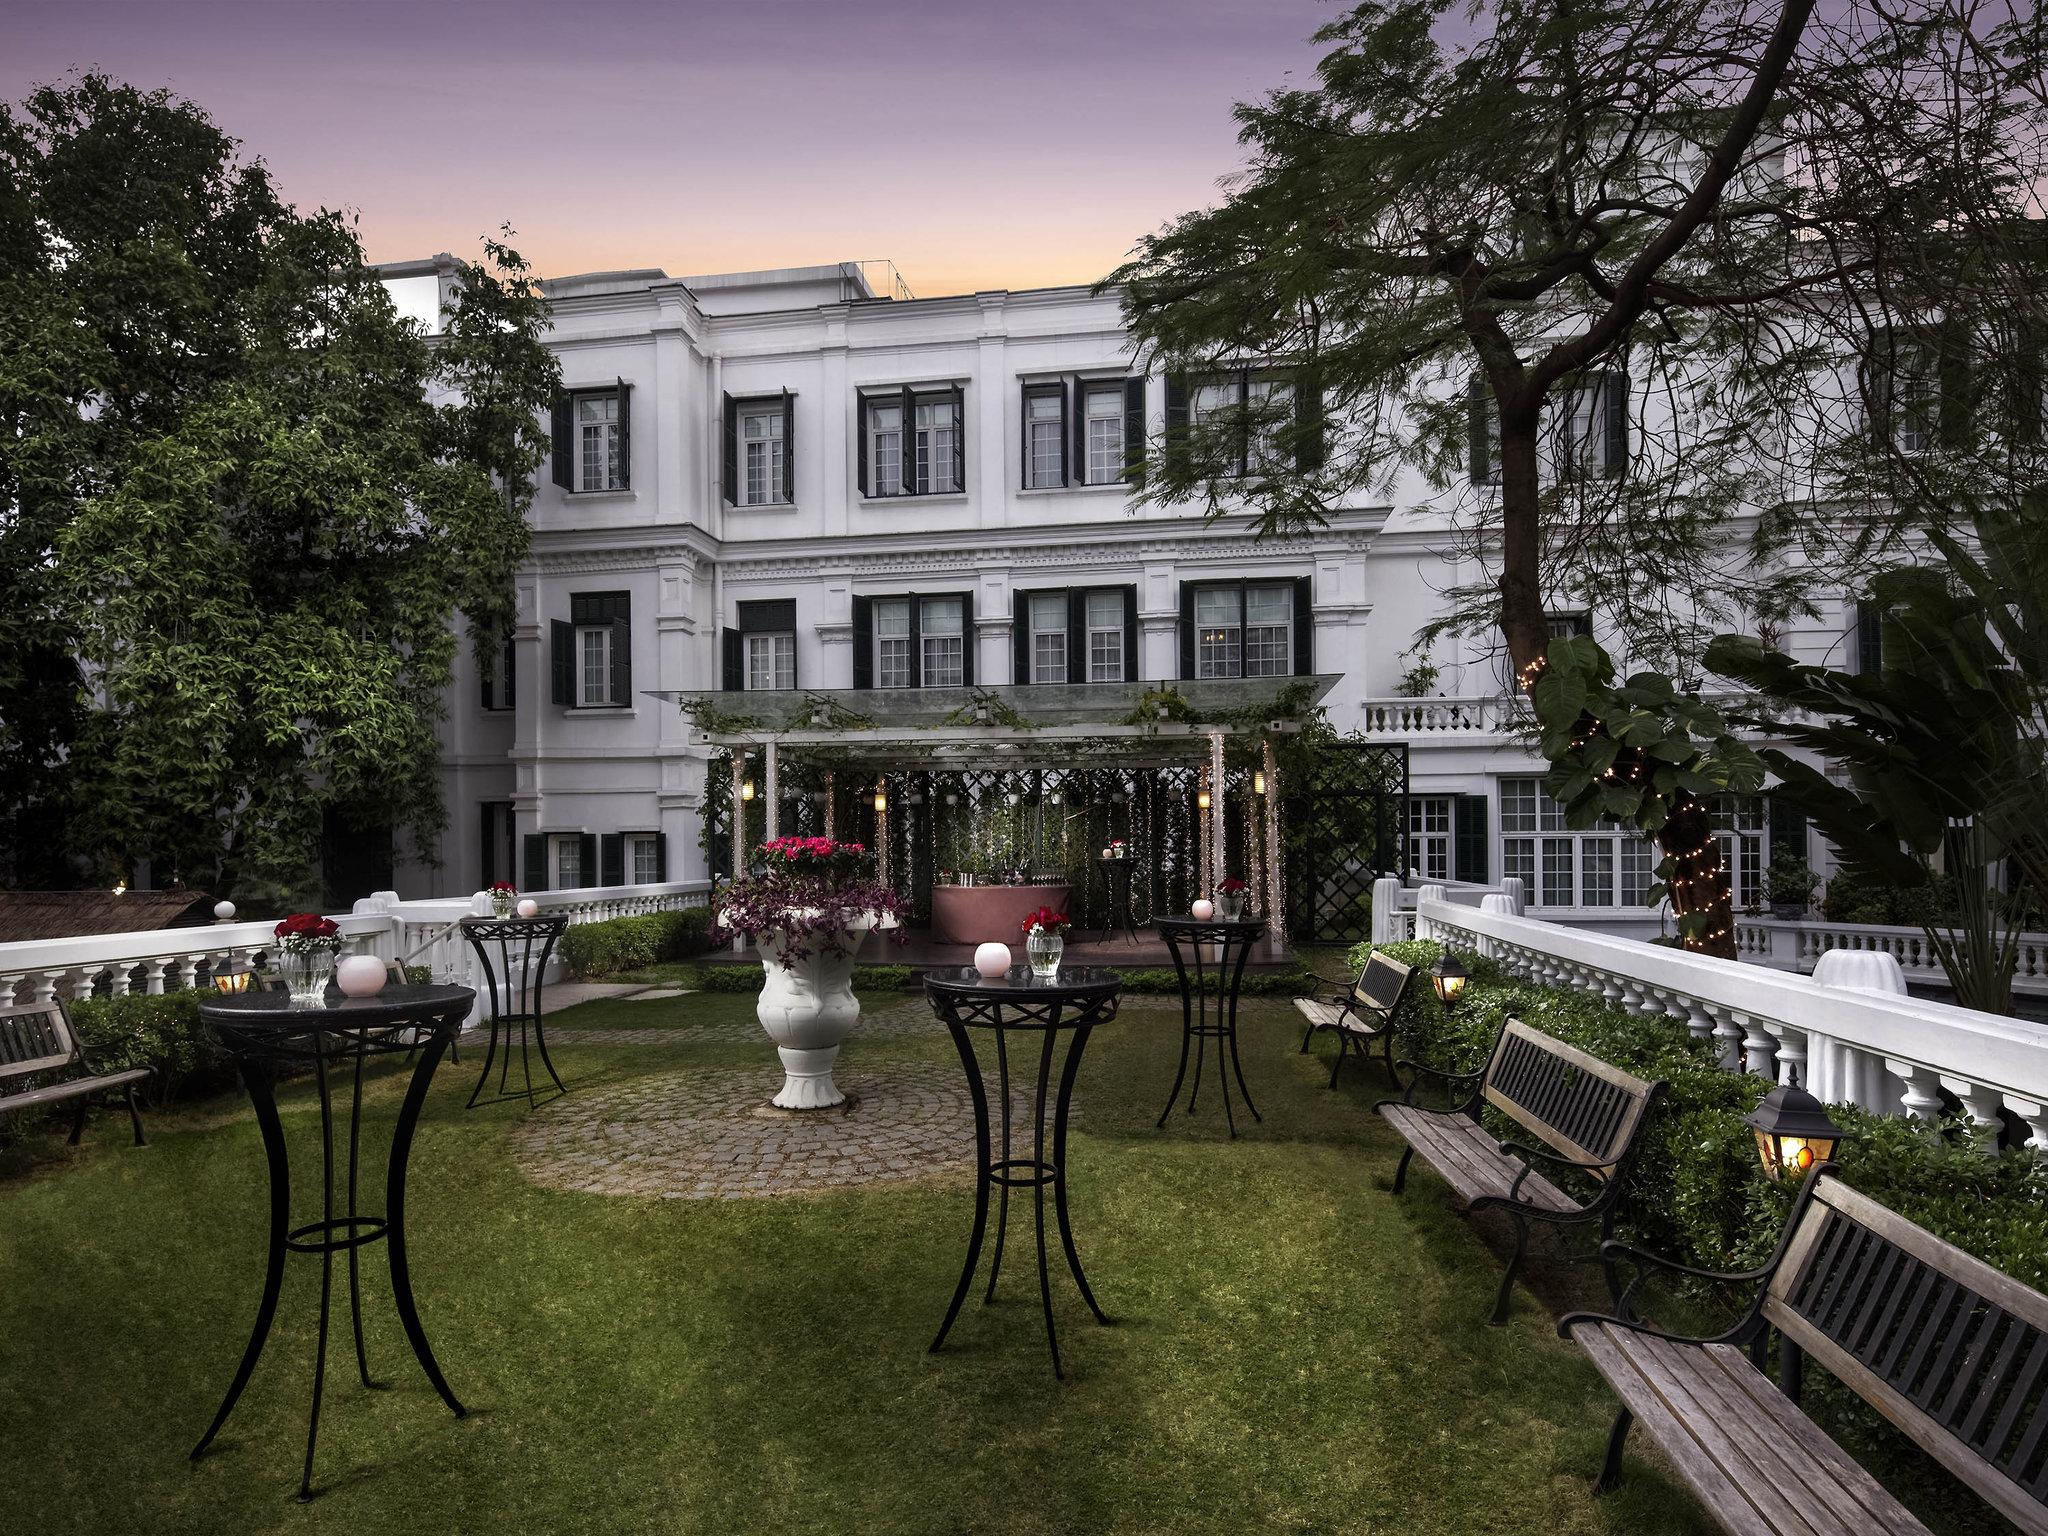 Honeymoon holiday destination hotel Sofitel Legend Metropole, Hanoi Vietnam